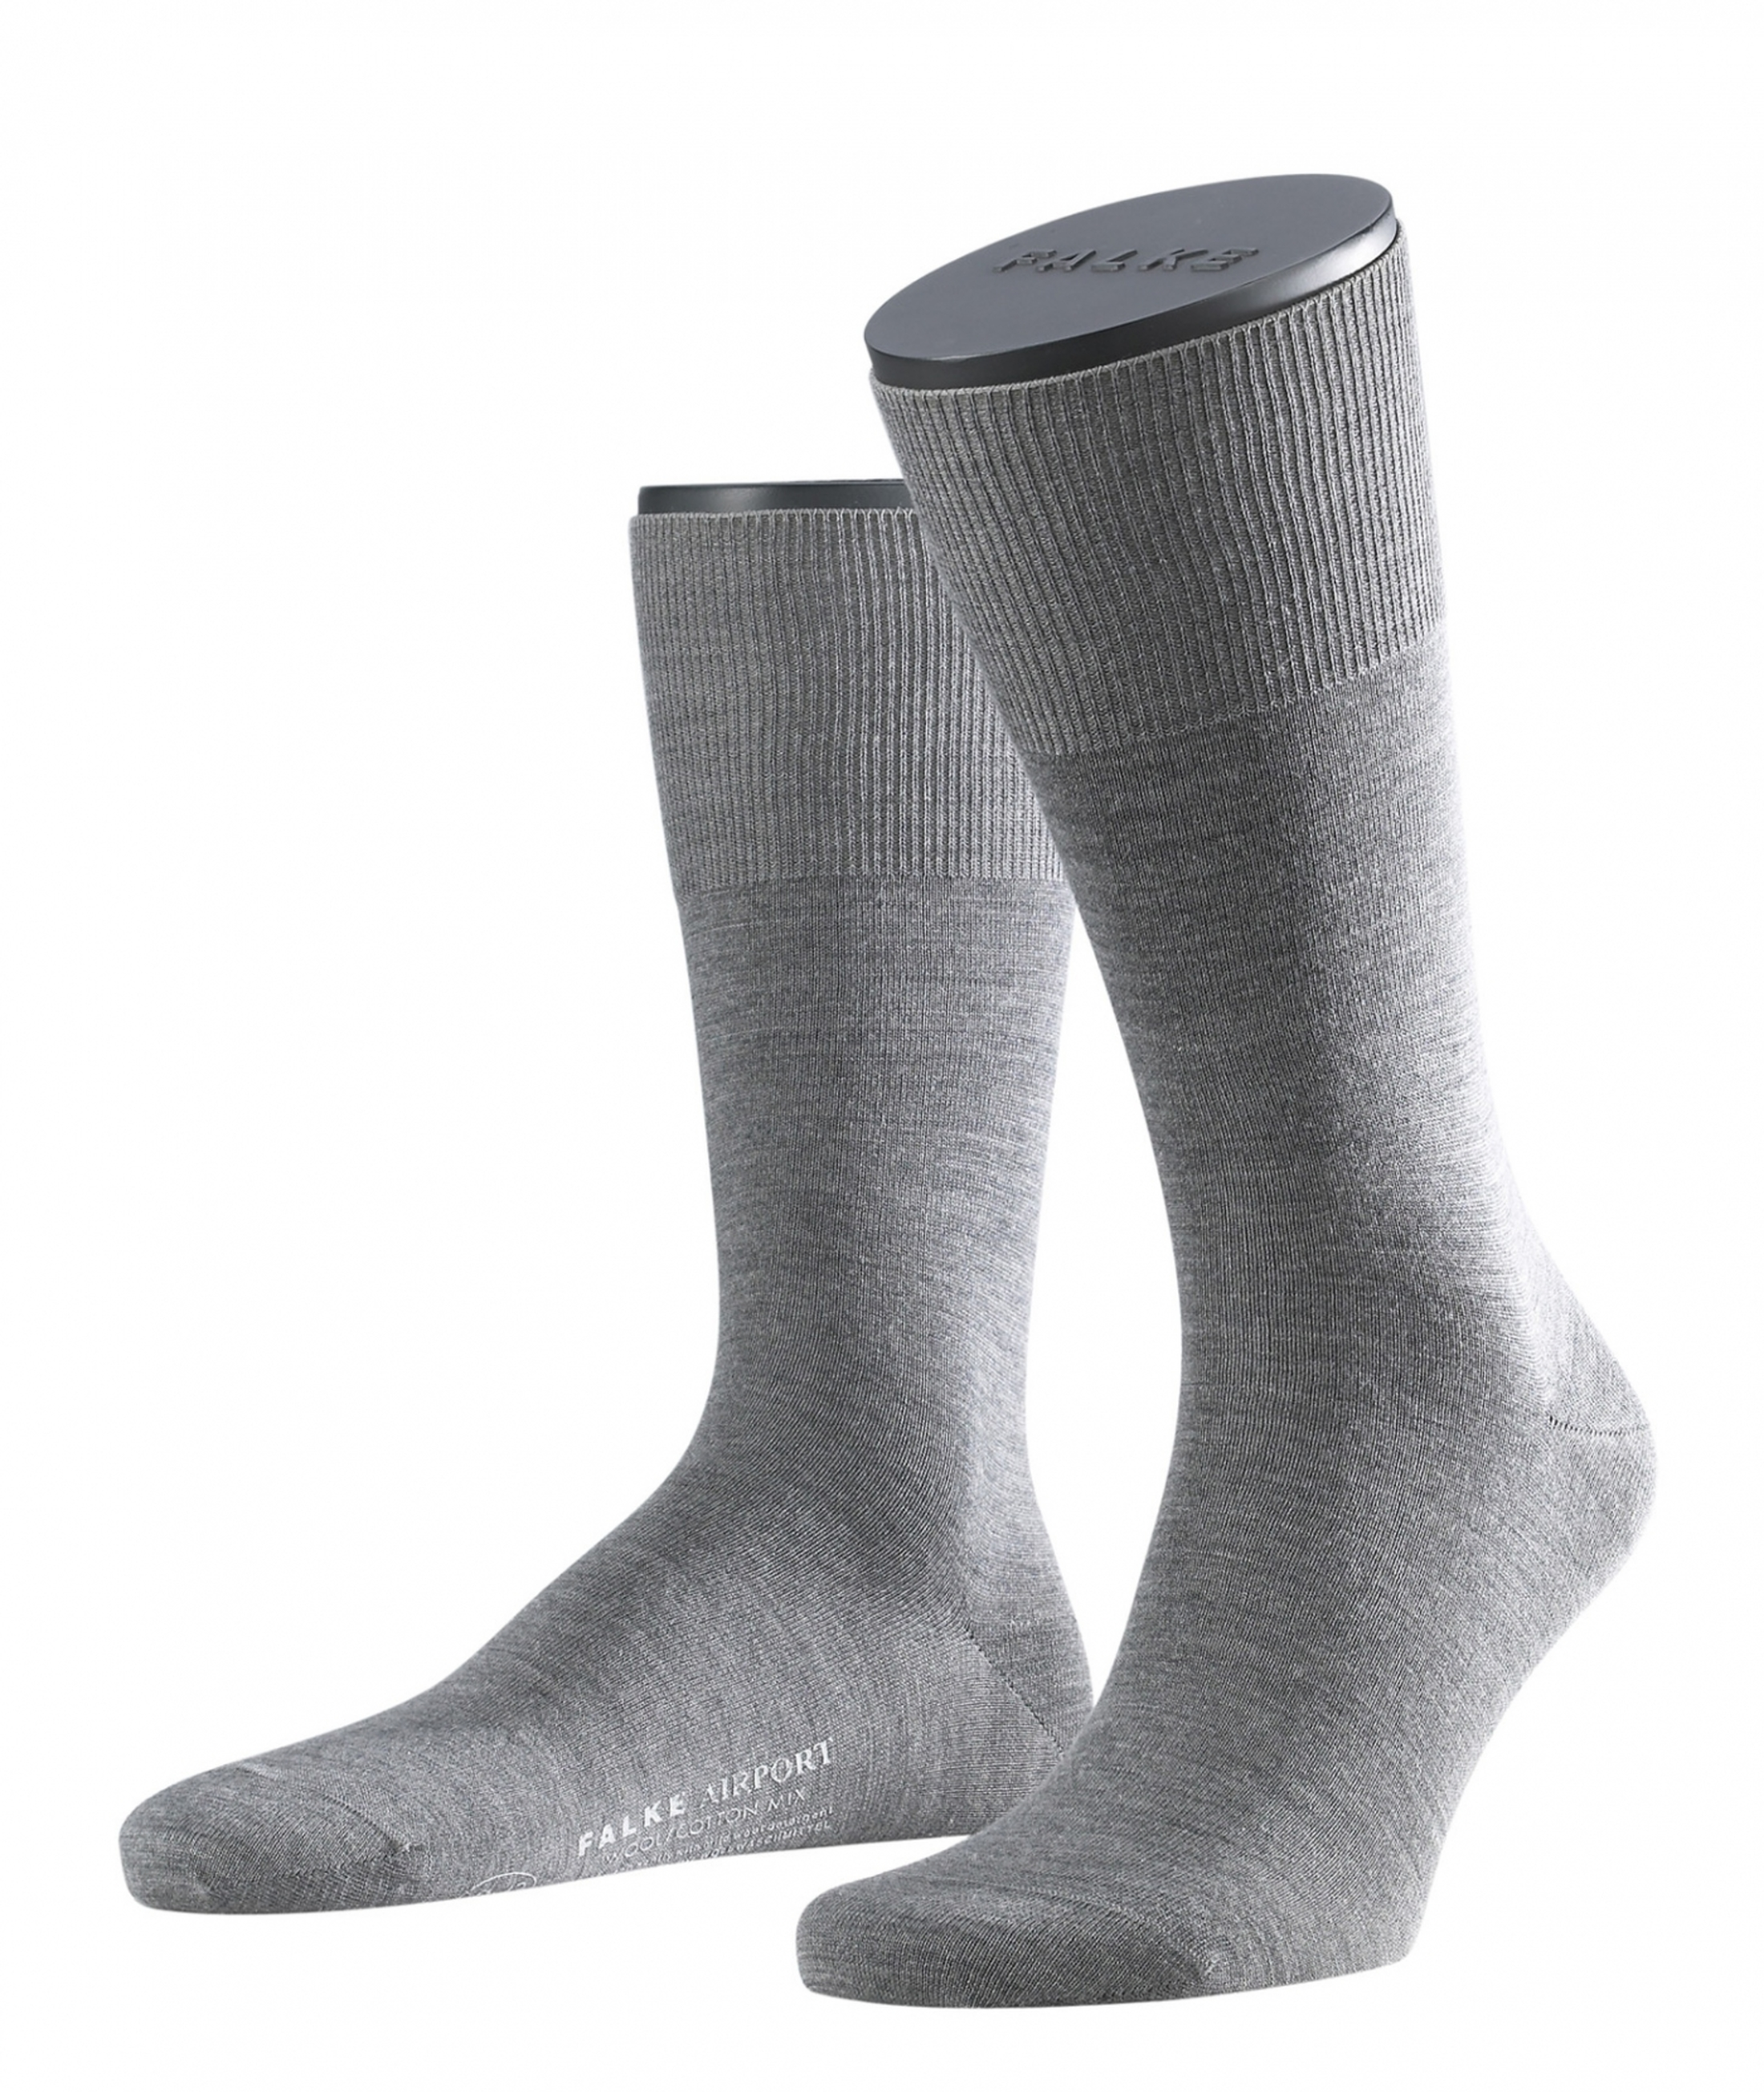 FALKE Airport Socken Grau 3070 foto 0